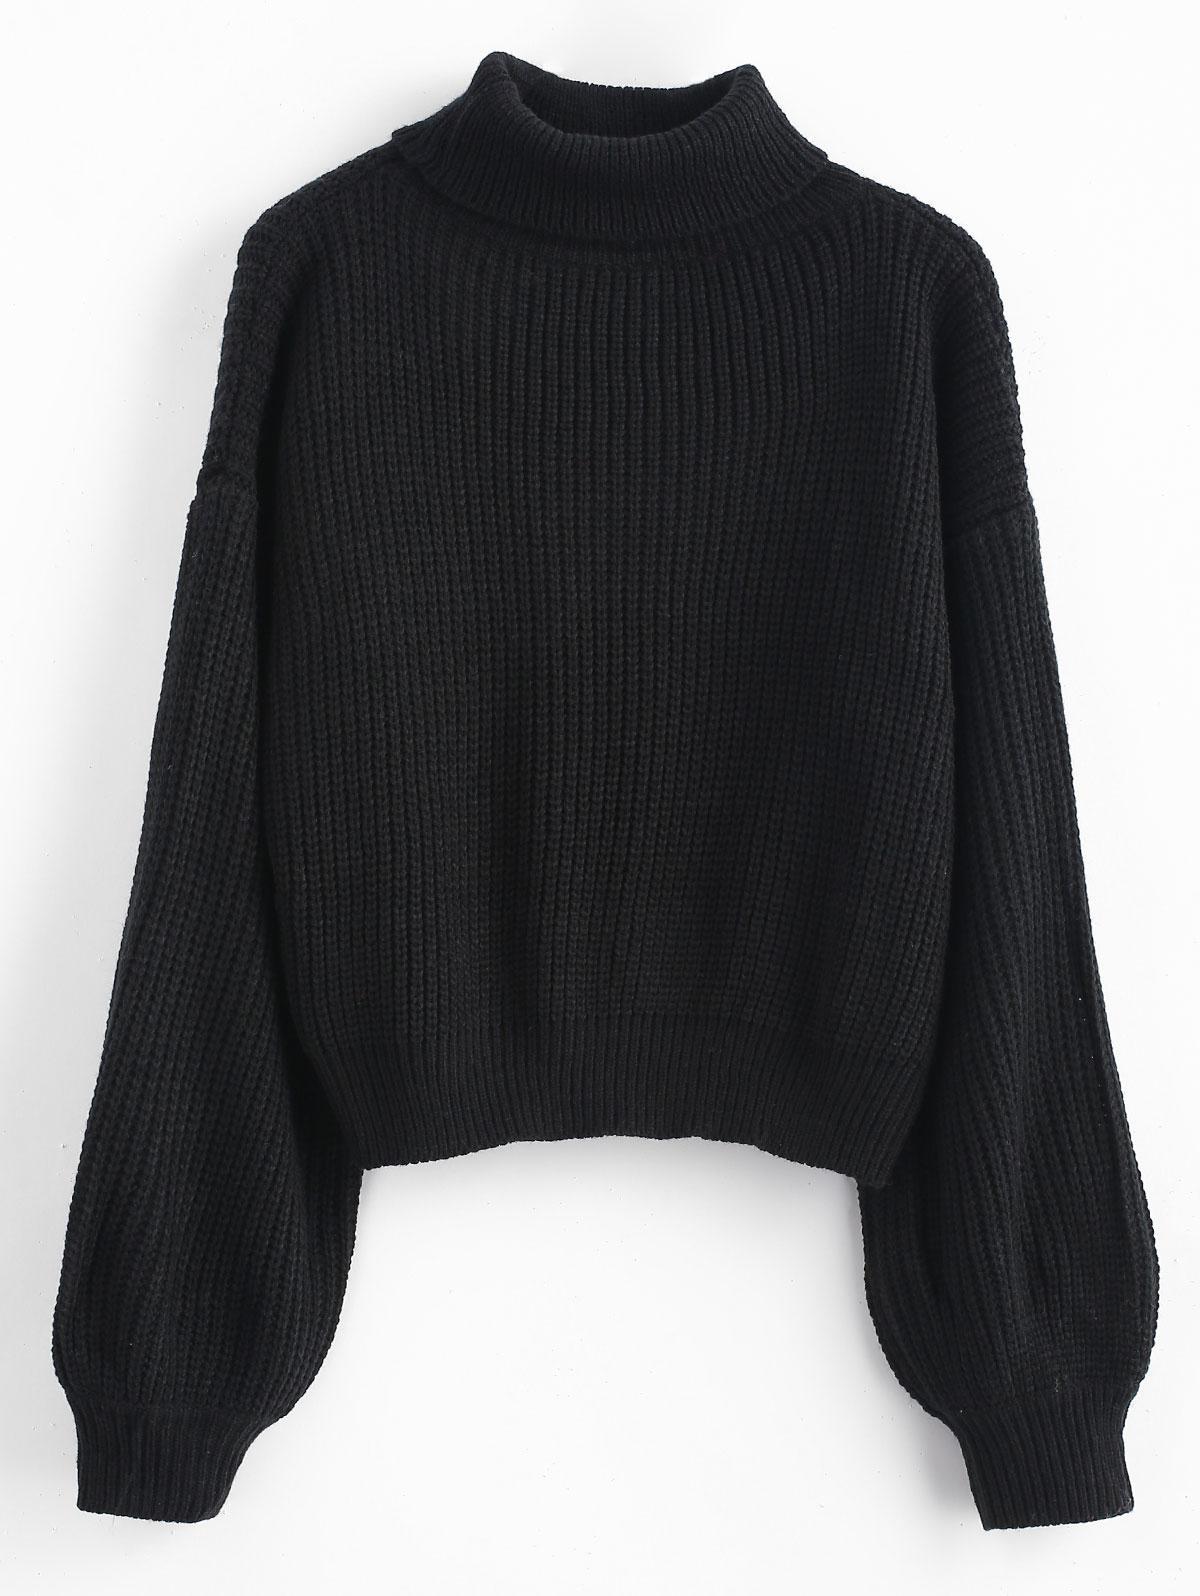 Turtleneck Lantern Sleeves Chunky Sweater